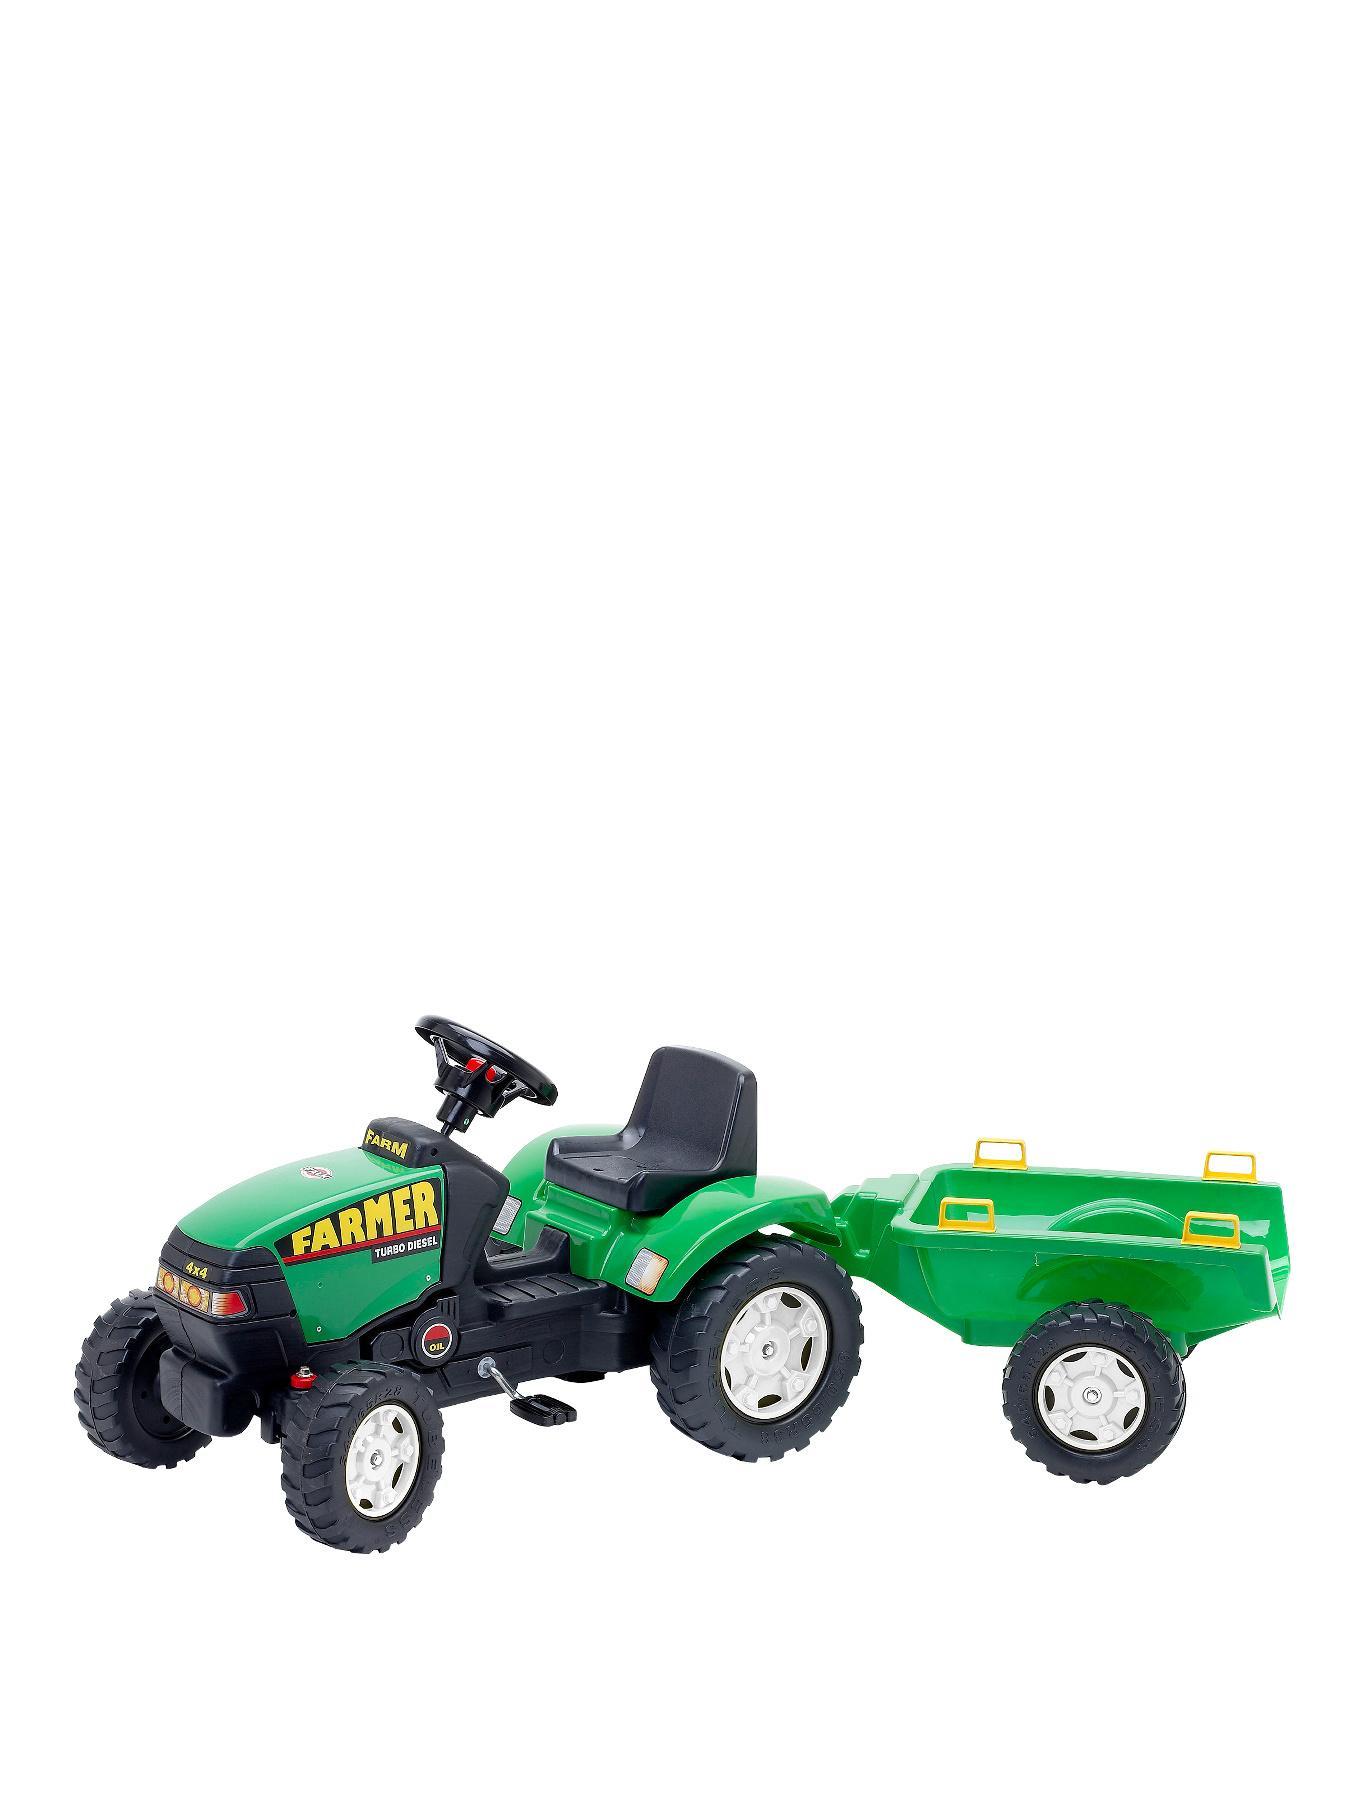 FALK Farmer Tractor and Trailer